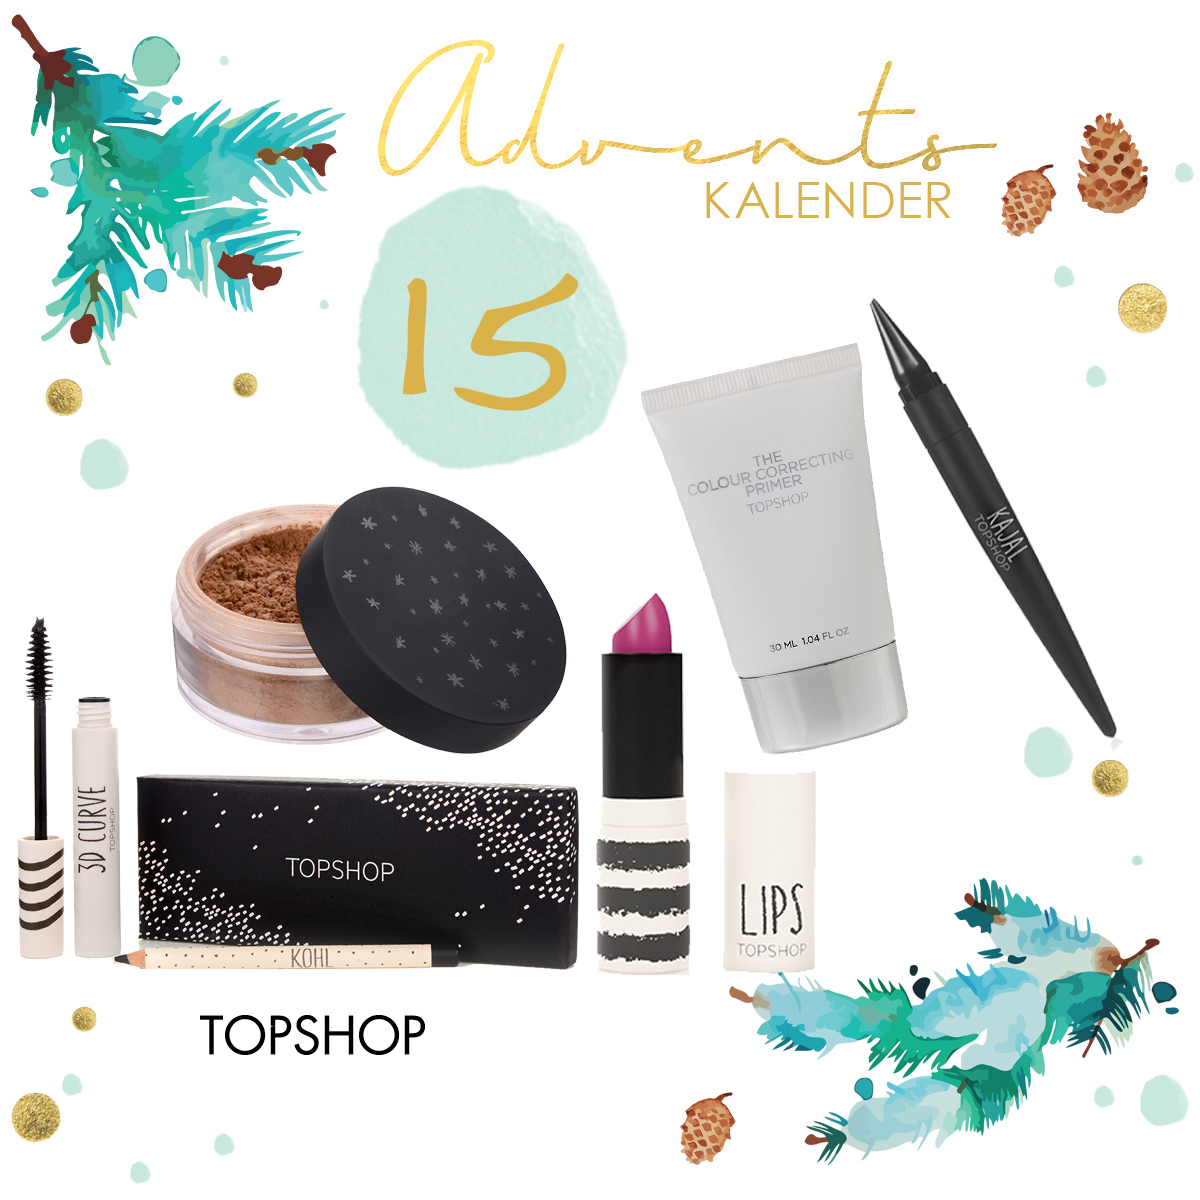 topshop-beauty-paket